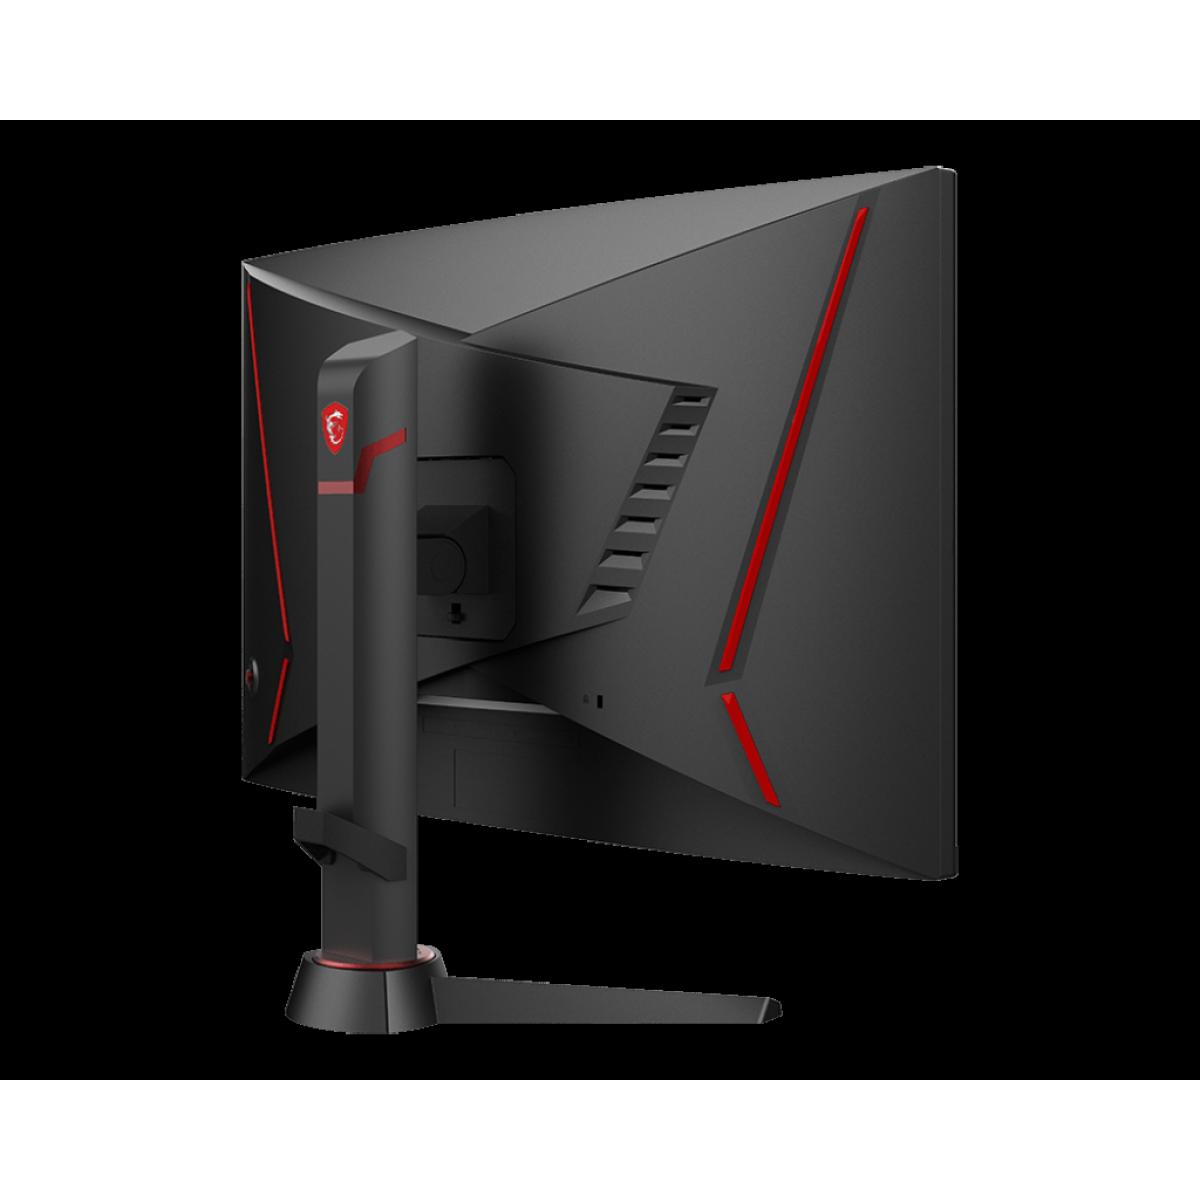 Monitor Gamer MSI Optix, 27 Pol, FullHD, Curvo, 165Hz, 1ms, HDMI/DP, MAG270VC2